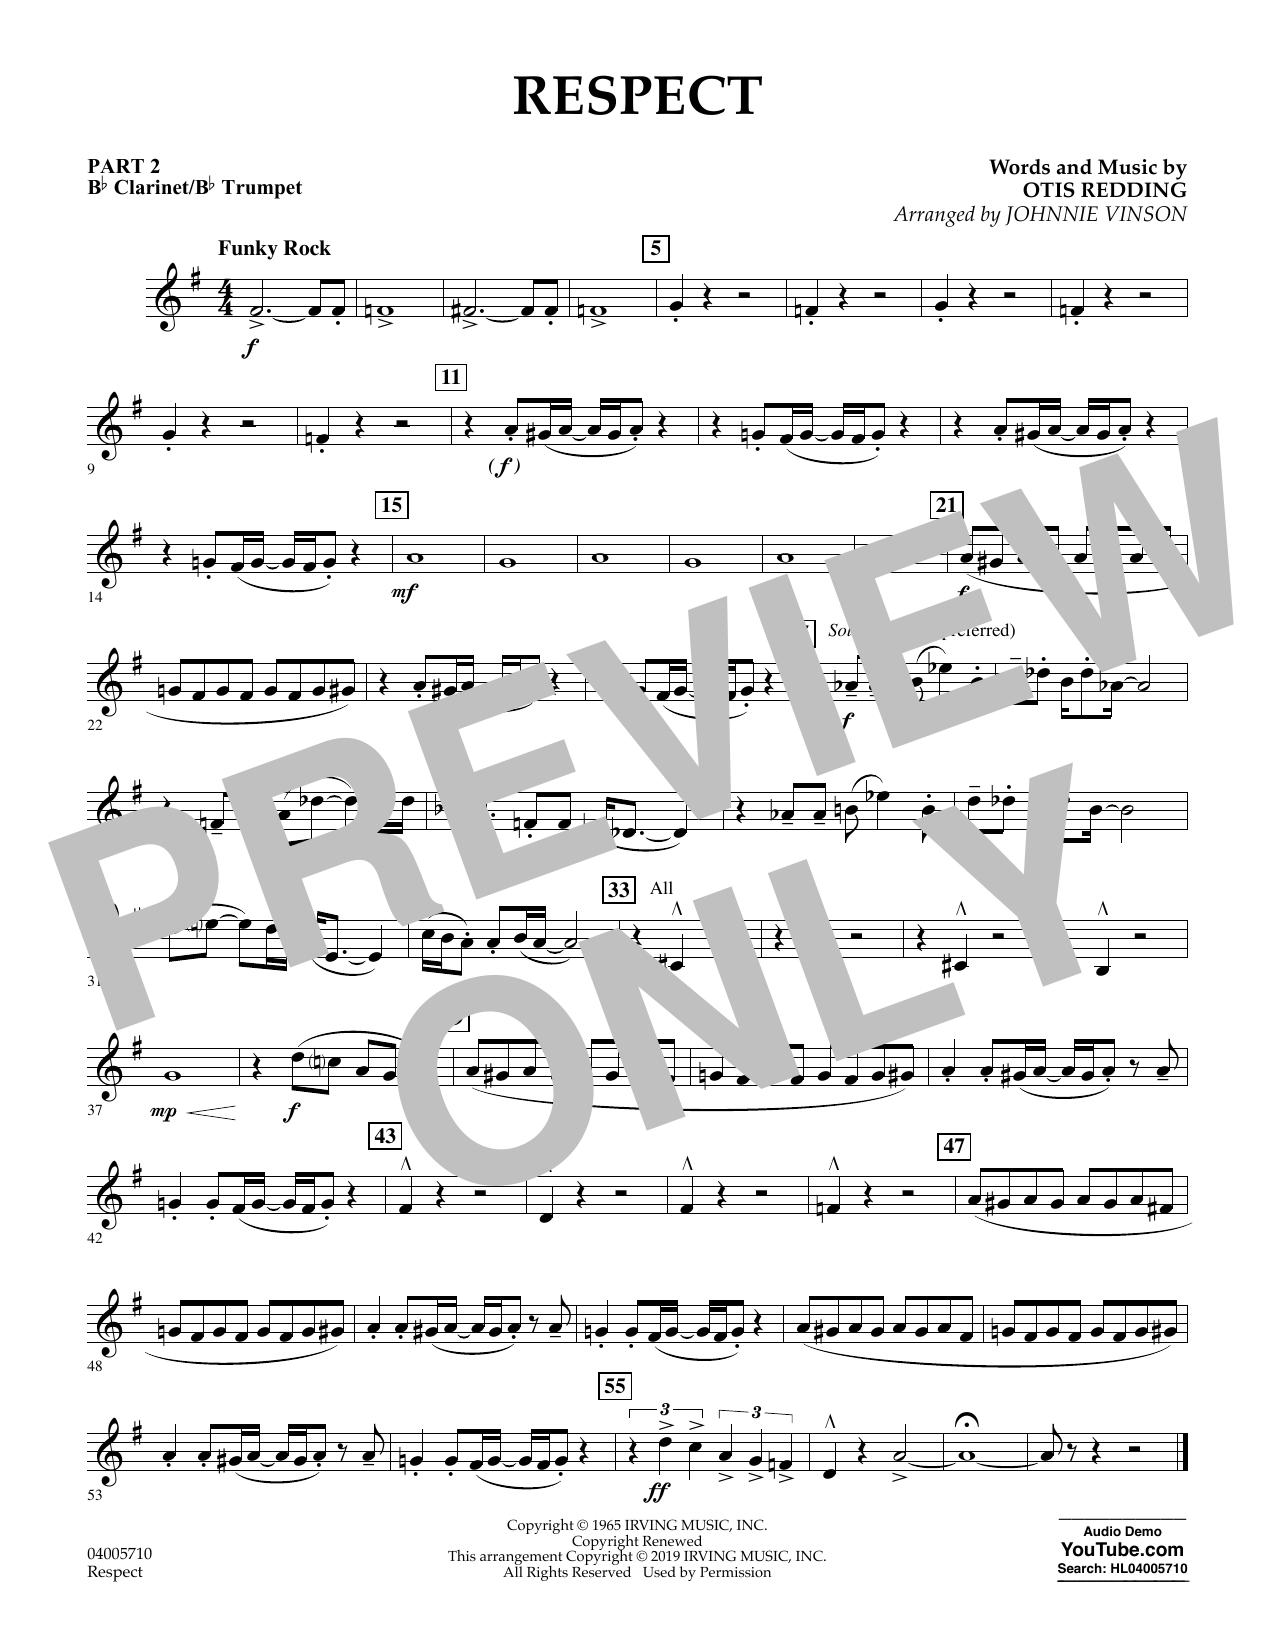 Respect (arr. Johnnie Vinson) - Pt.2 - Bb Clarinet/Bb Trumpet (Concert Band: Flex-Band)